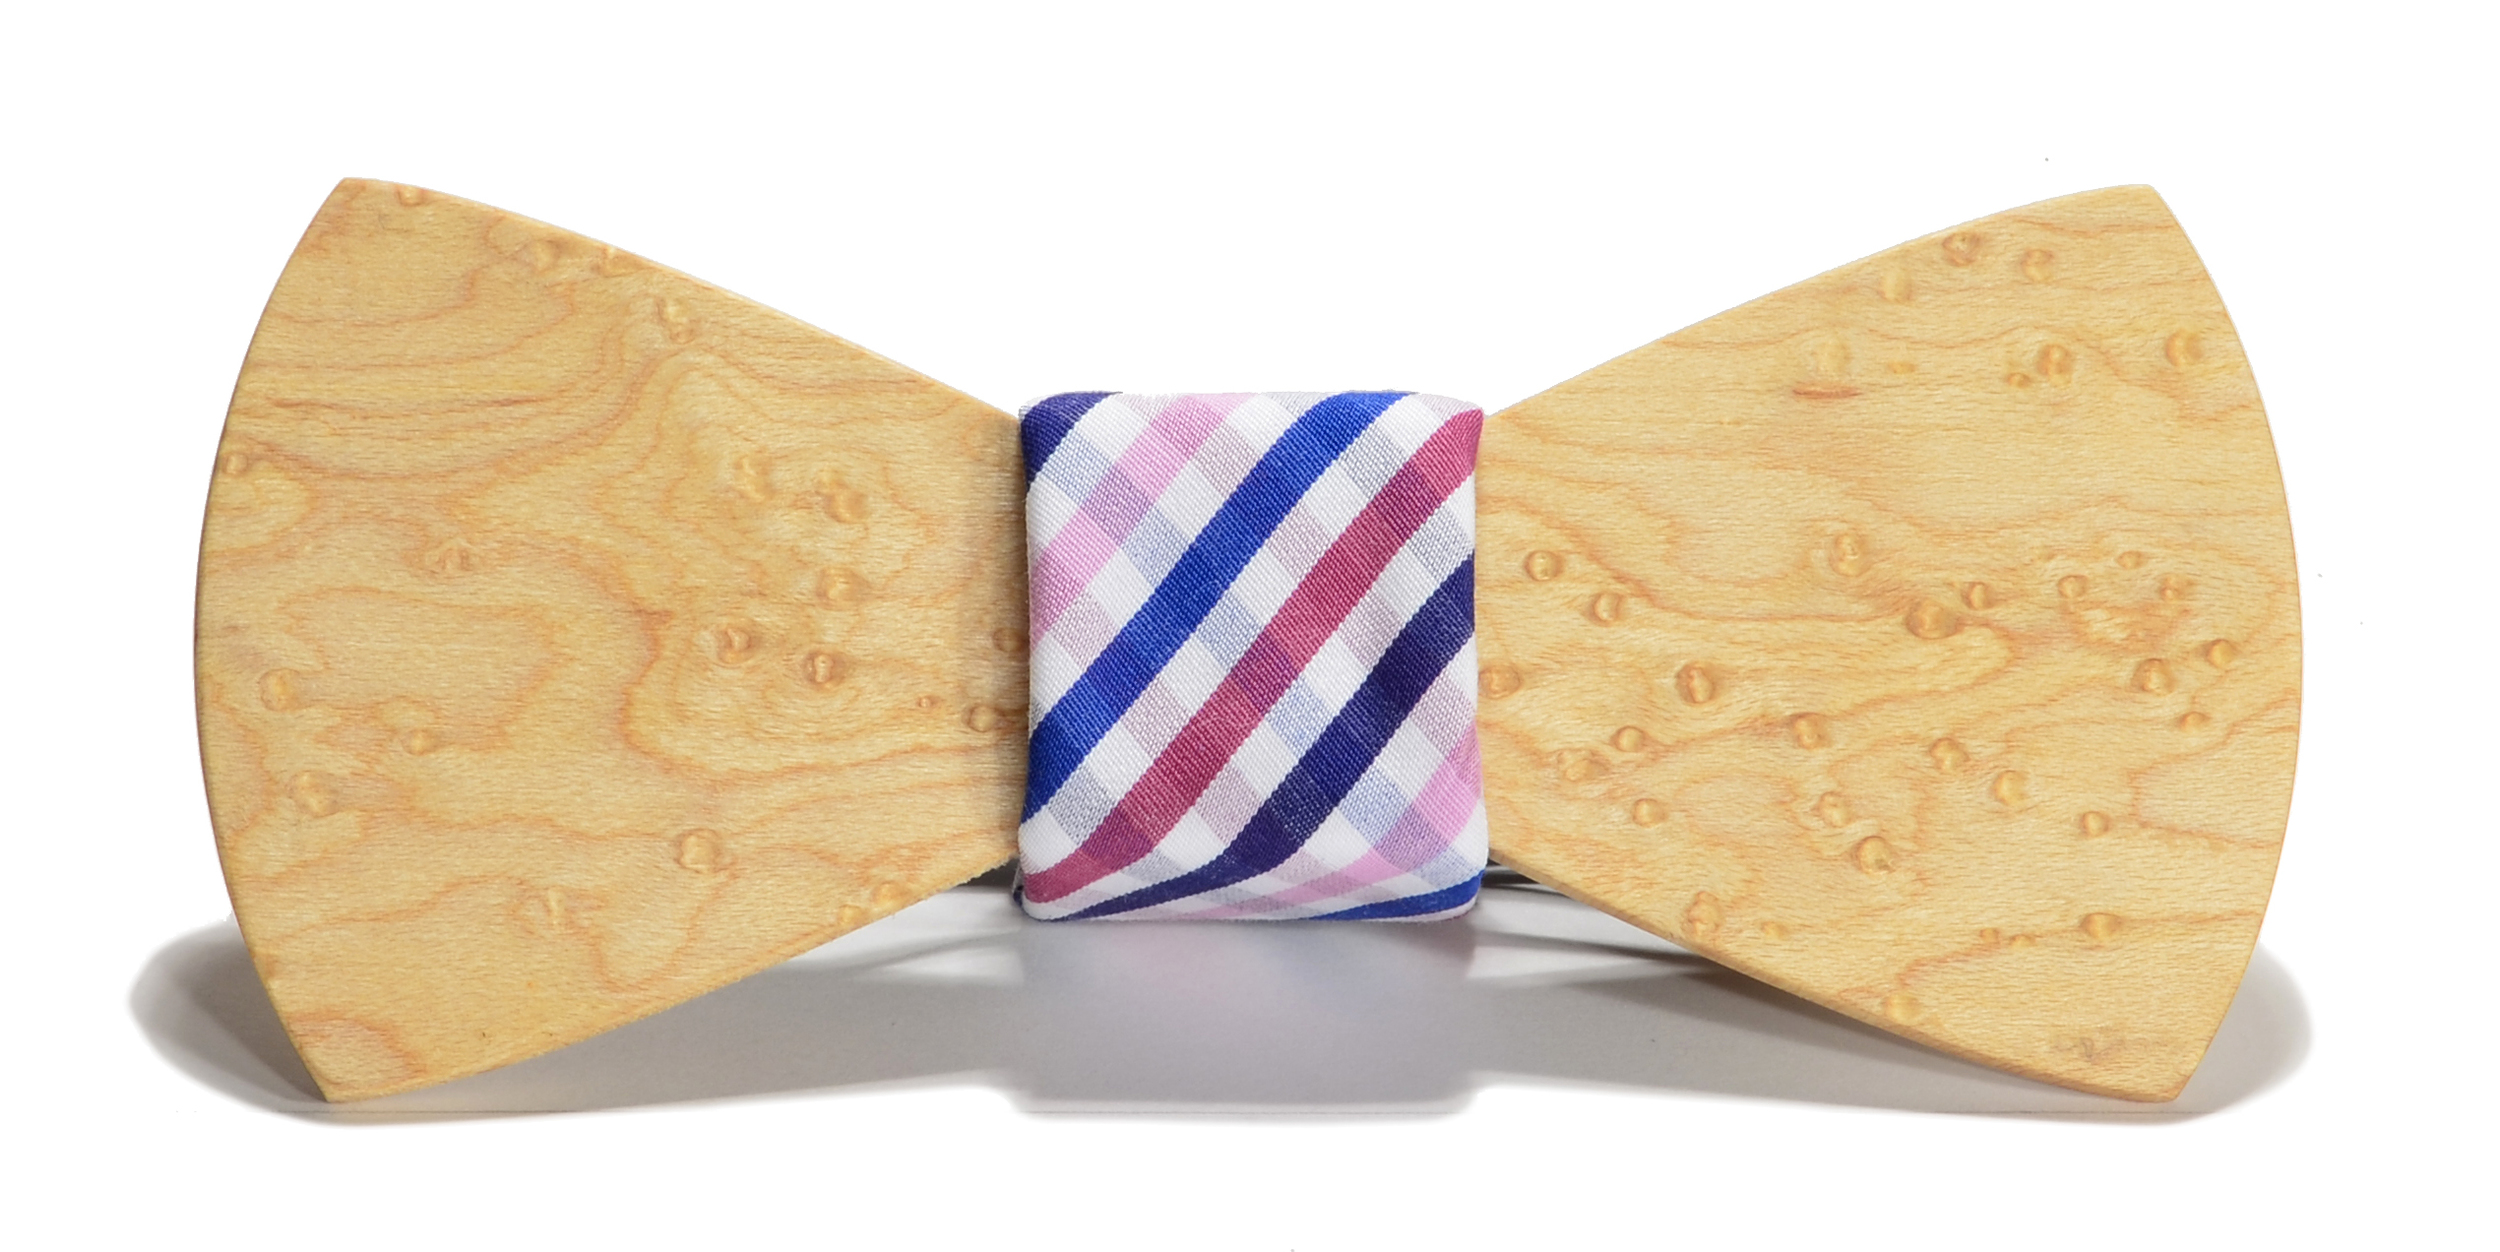 The Bordeaux Birdseye Maple Traditonal Cotton Wooden Bow Tie